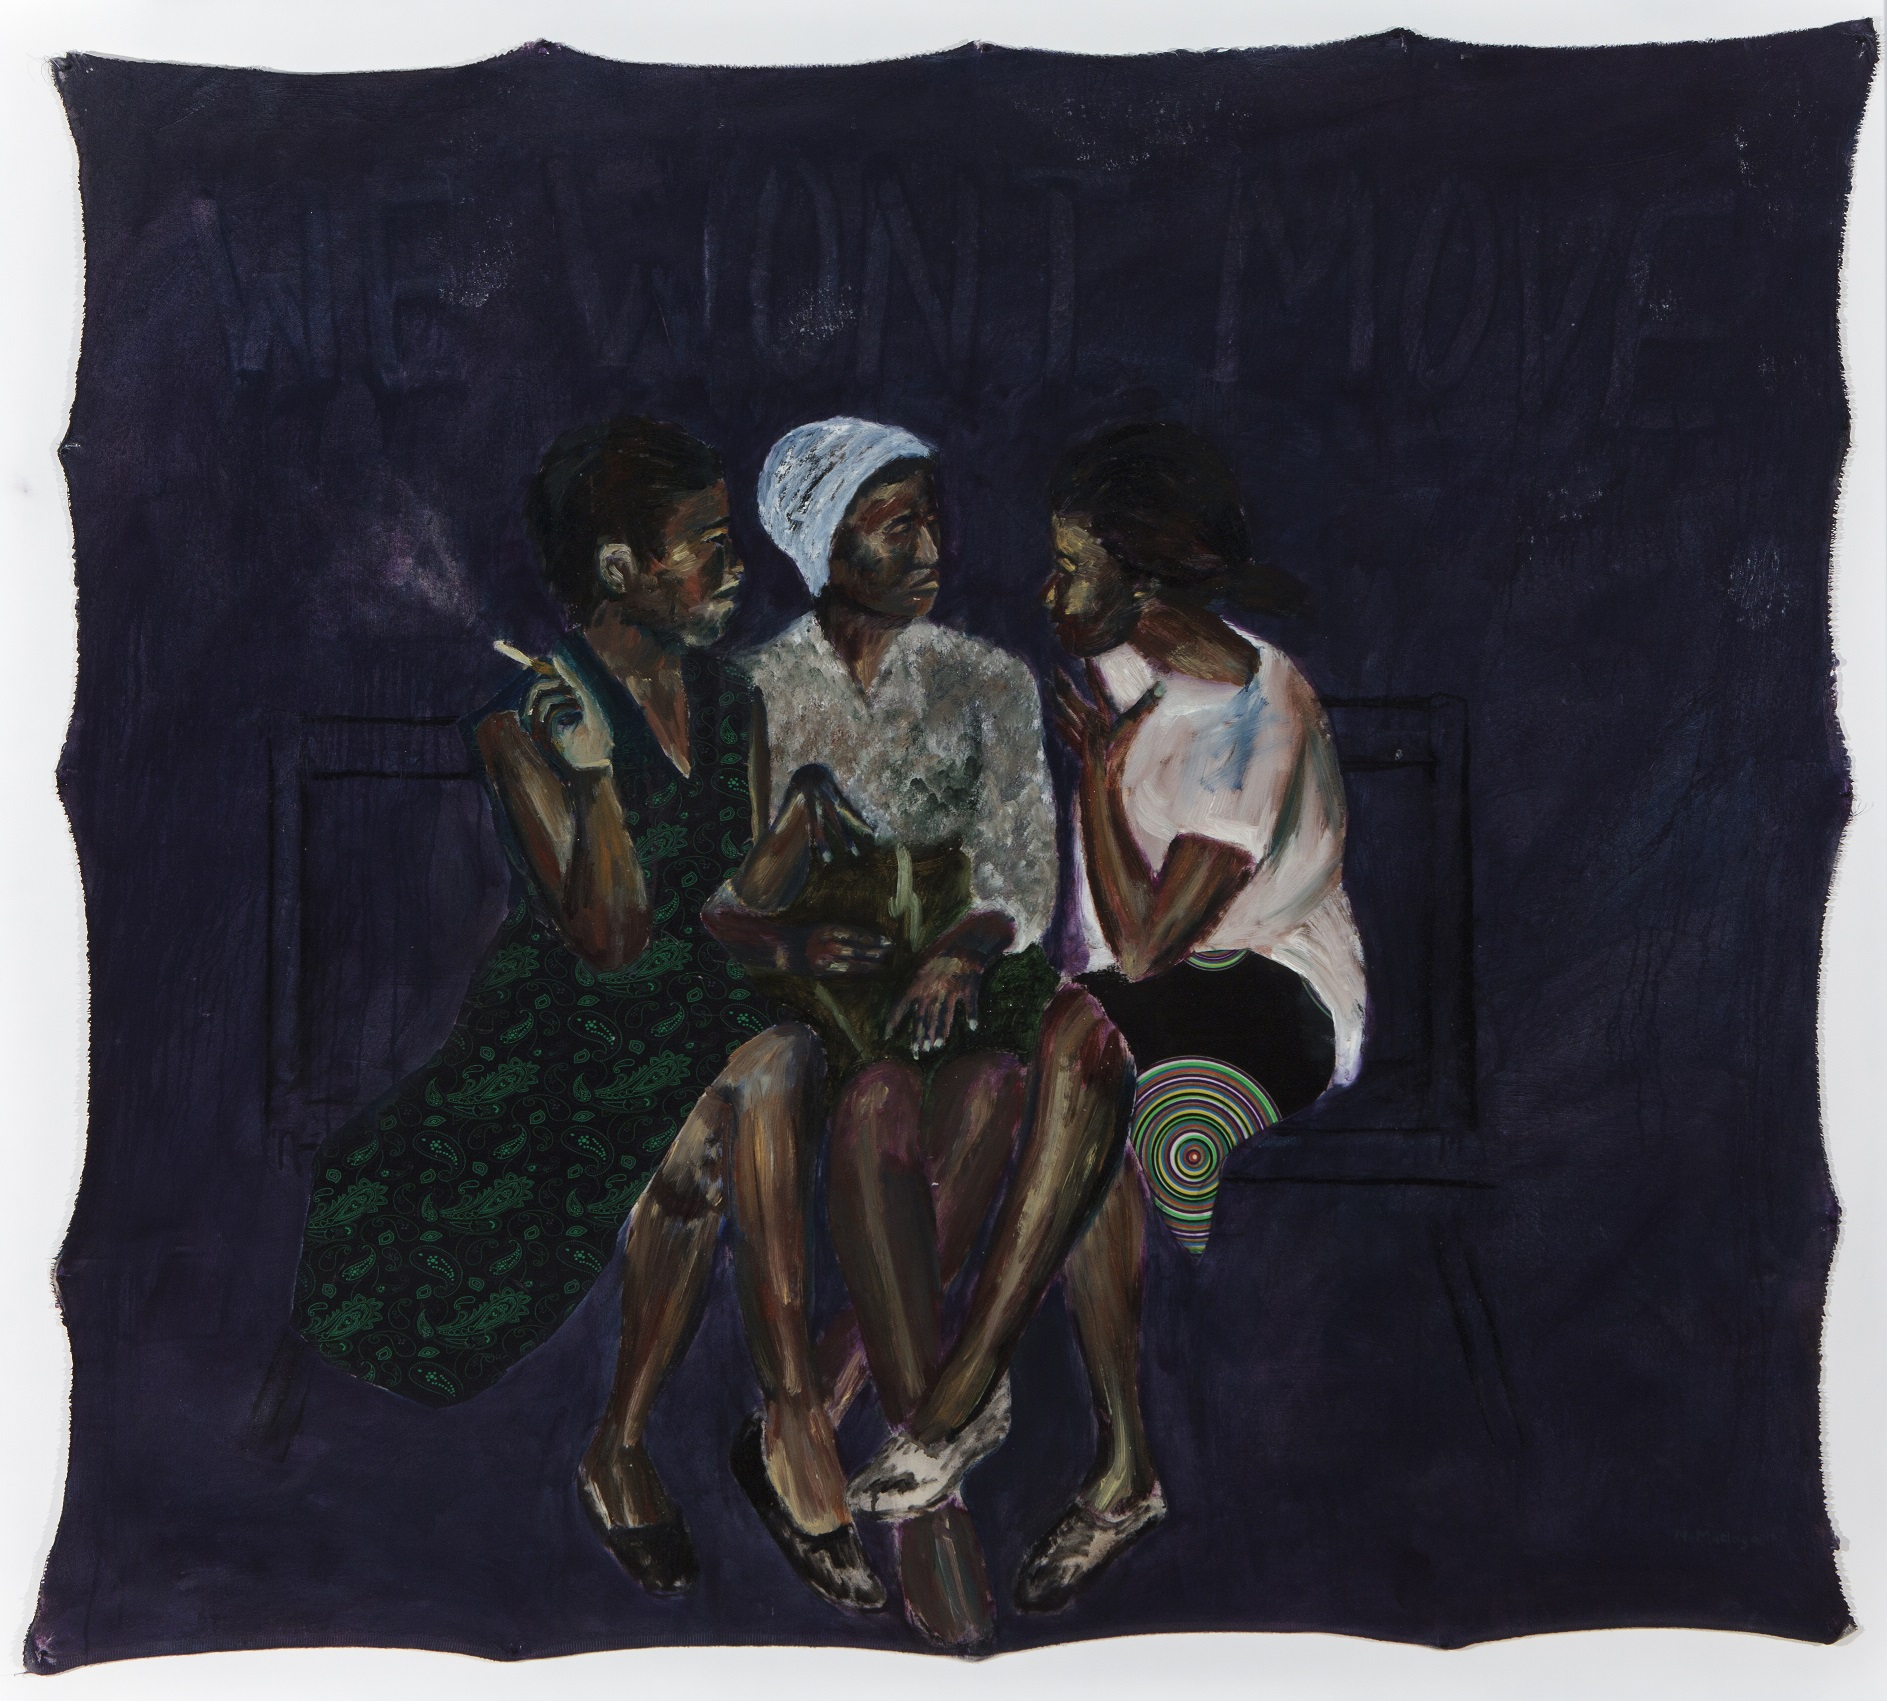 Neo Matloga, Bo mma sebotsana, 2017, oil on collage on canvas, 145x160 cm, courtesy Christopher Moller Gallery.jpg